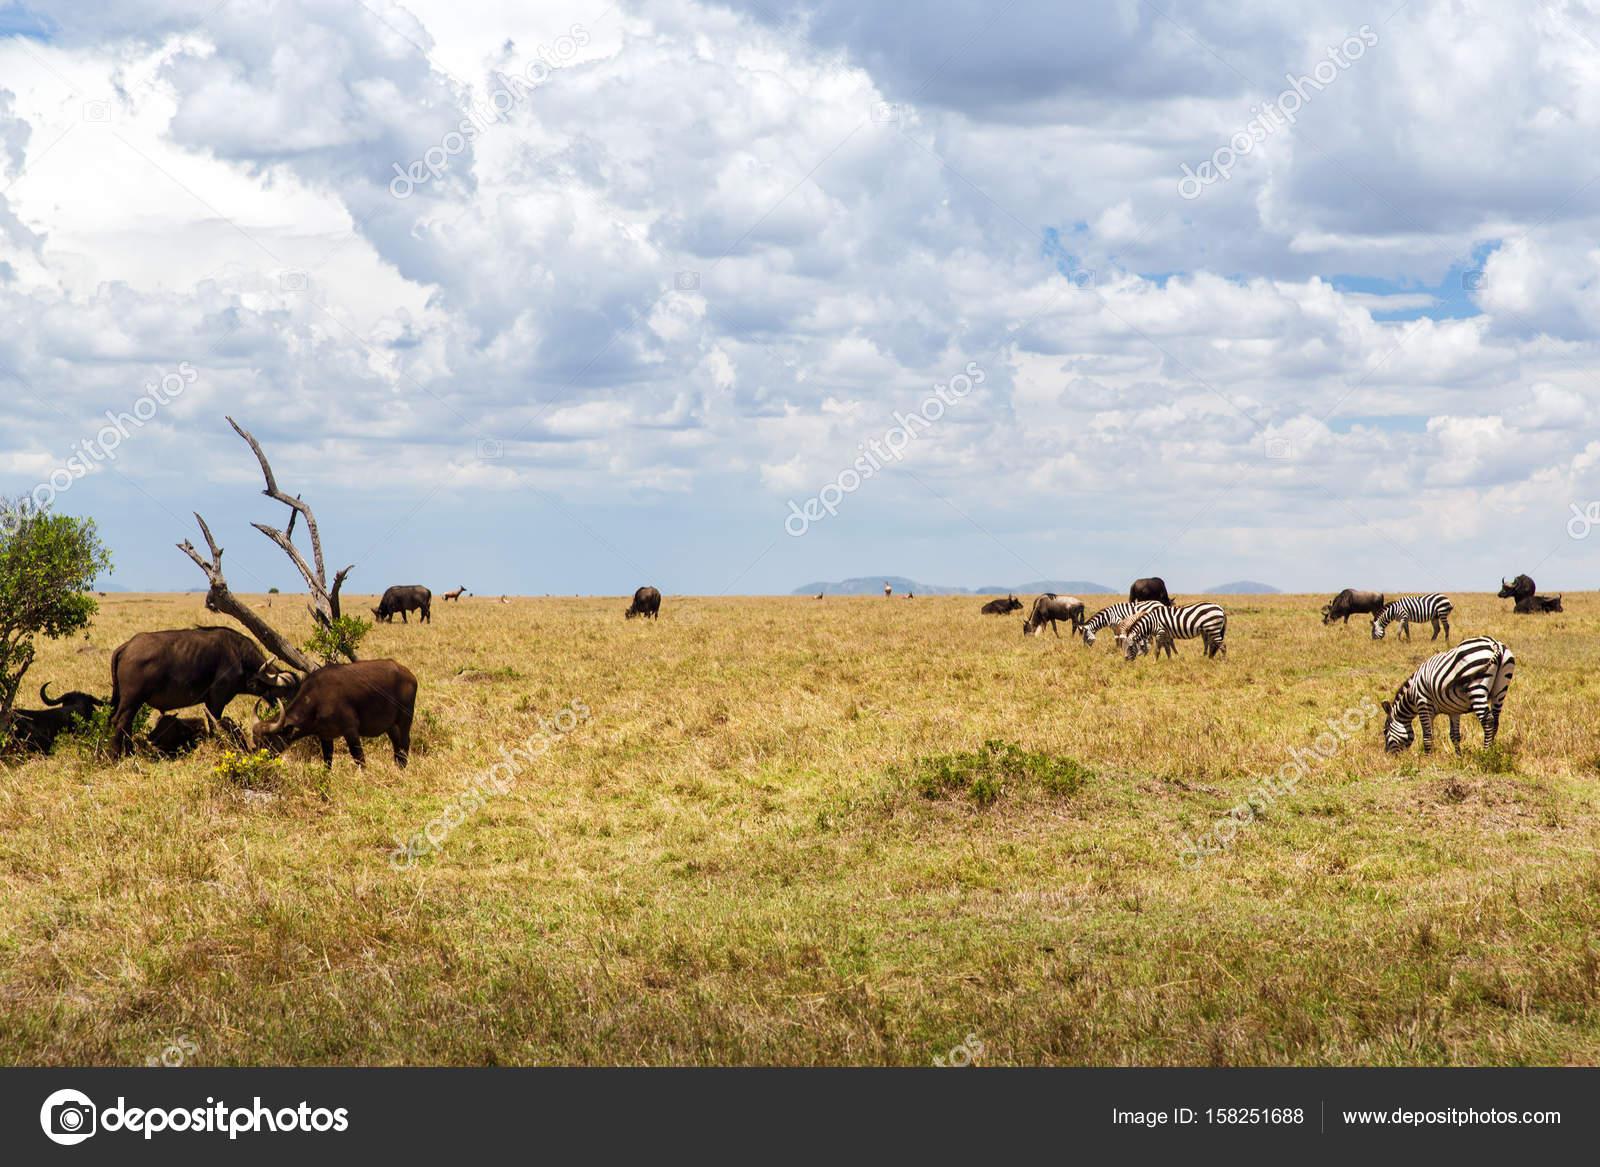 Herbivore Animals